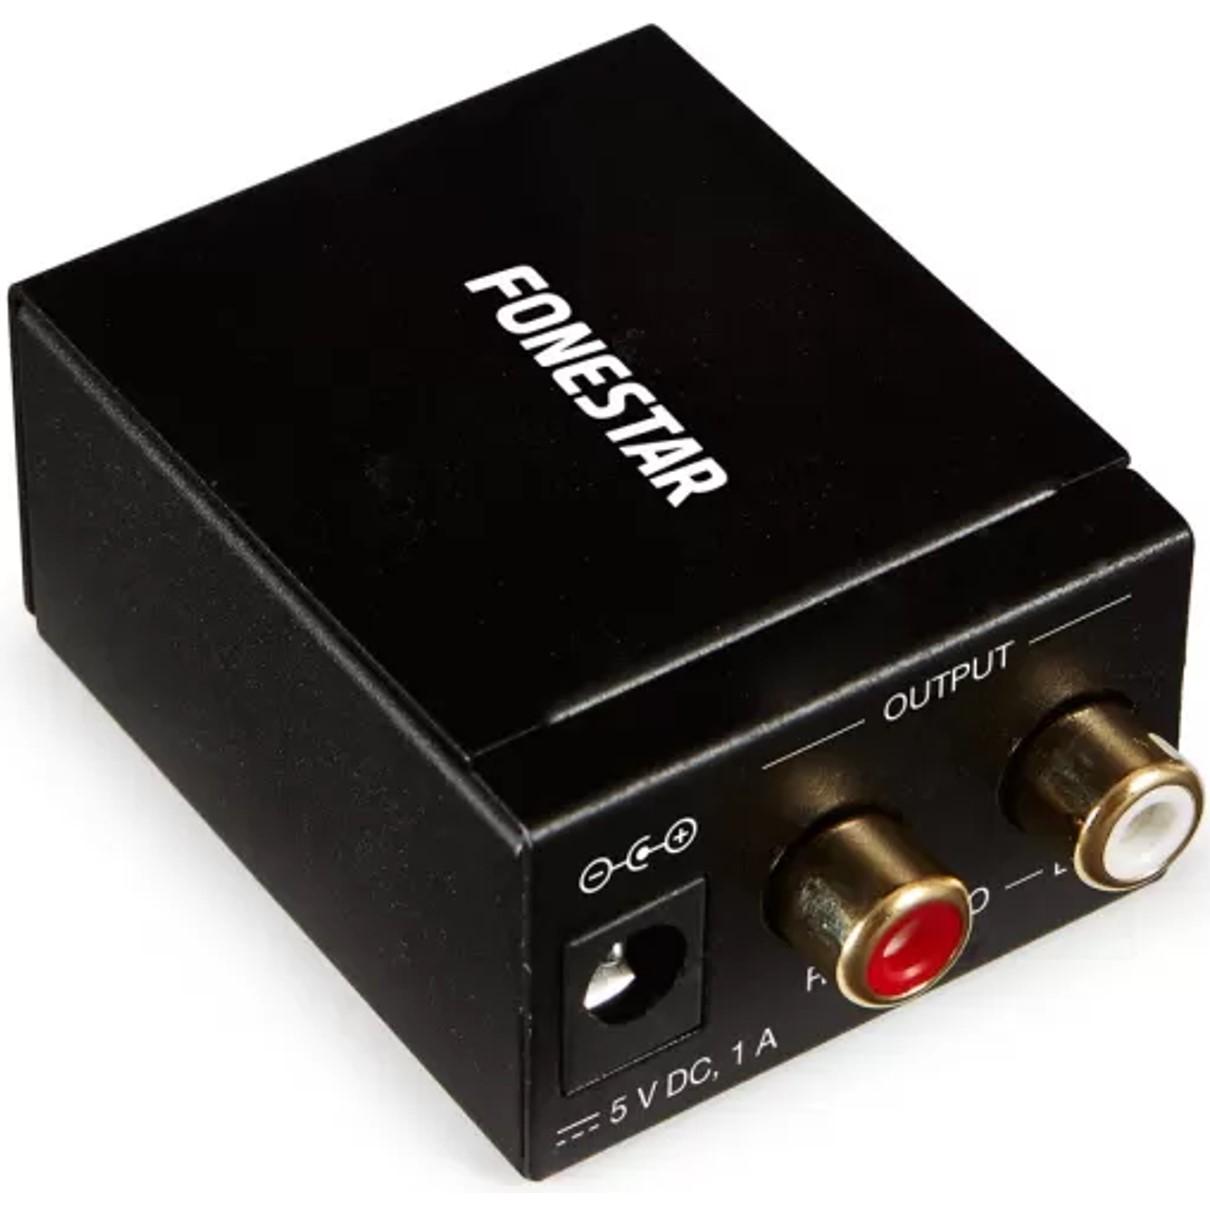 CONVERTIDOR DE AUDIO FONESTAR FO-37DA - CONVIERTE AUDIO DIGITAL EN ANALGICO - ENTRADA PTICA SPDIF / COAXIAL SPDIF - SALIDA AUDIO ESTREO - 2X RCA